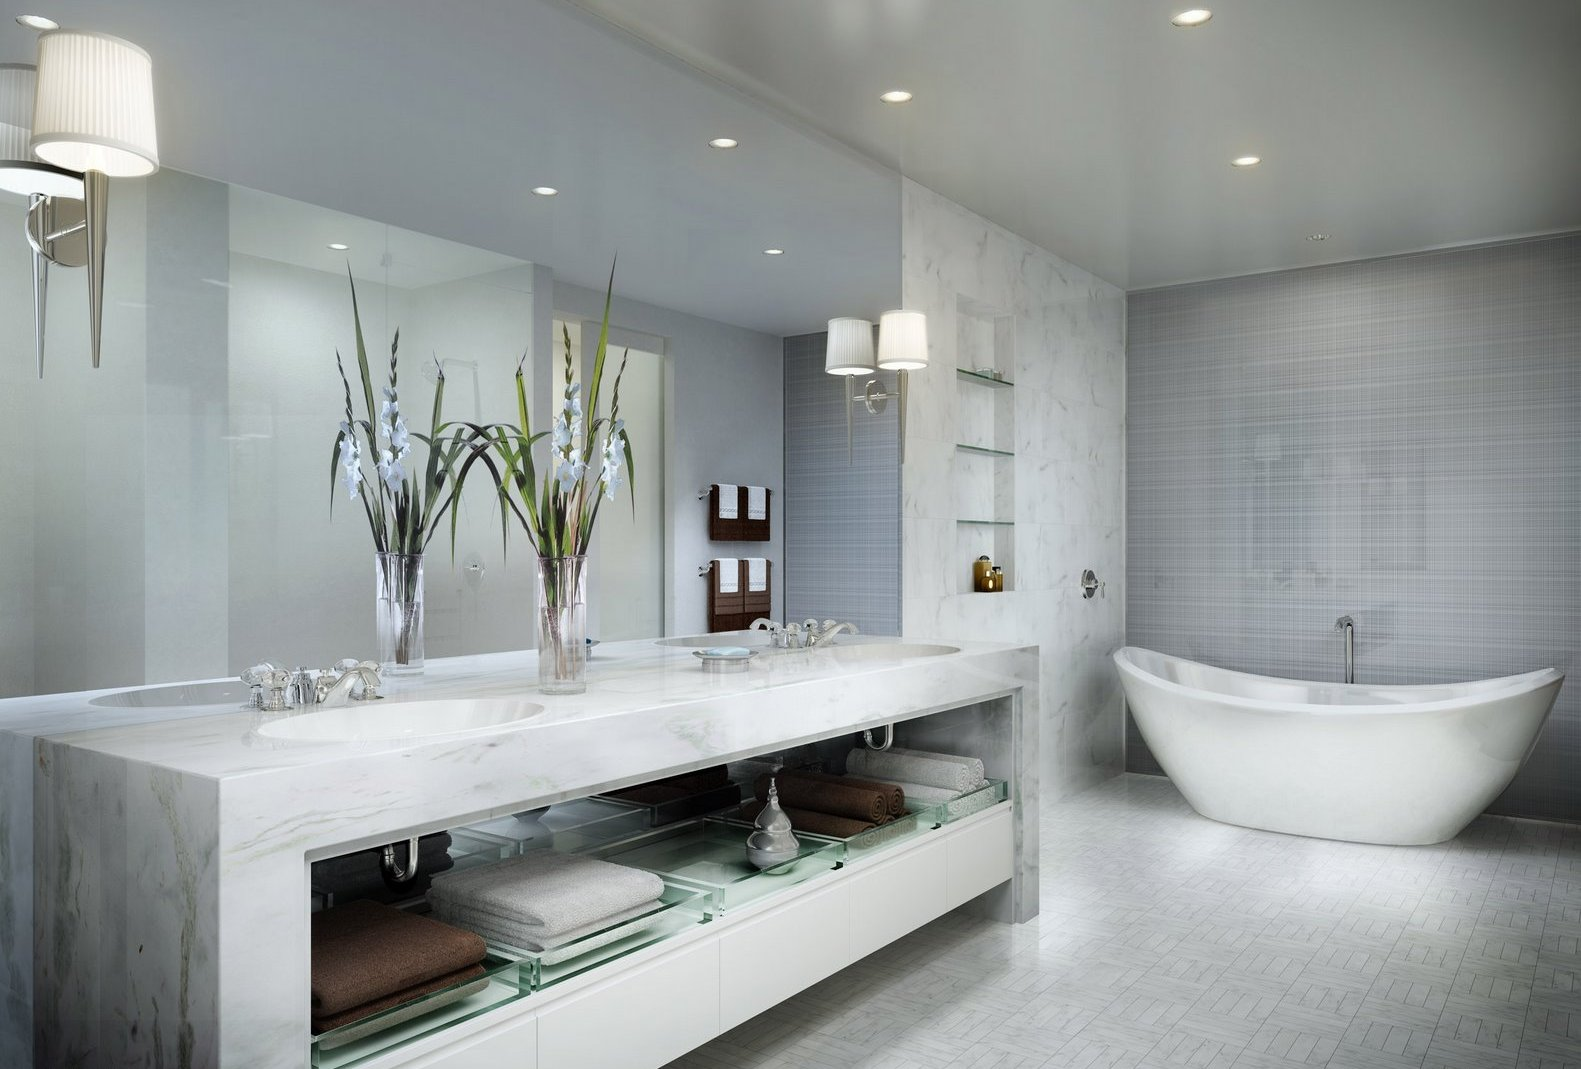 amazing-bathrooms-ideas-impressive-decoration-14-on-bathroom-designs